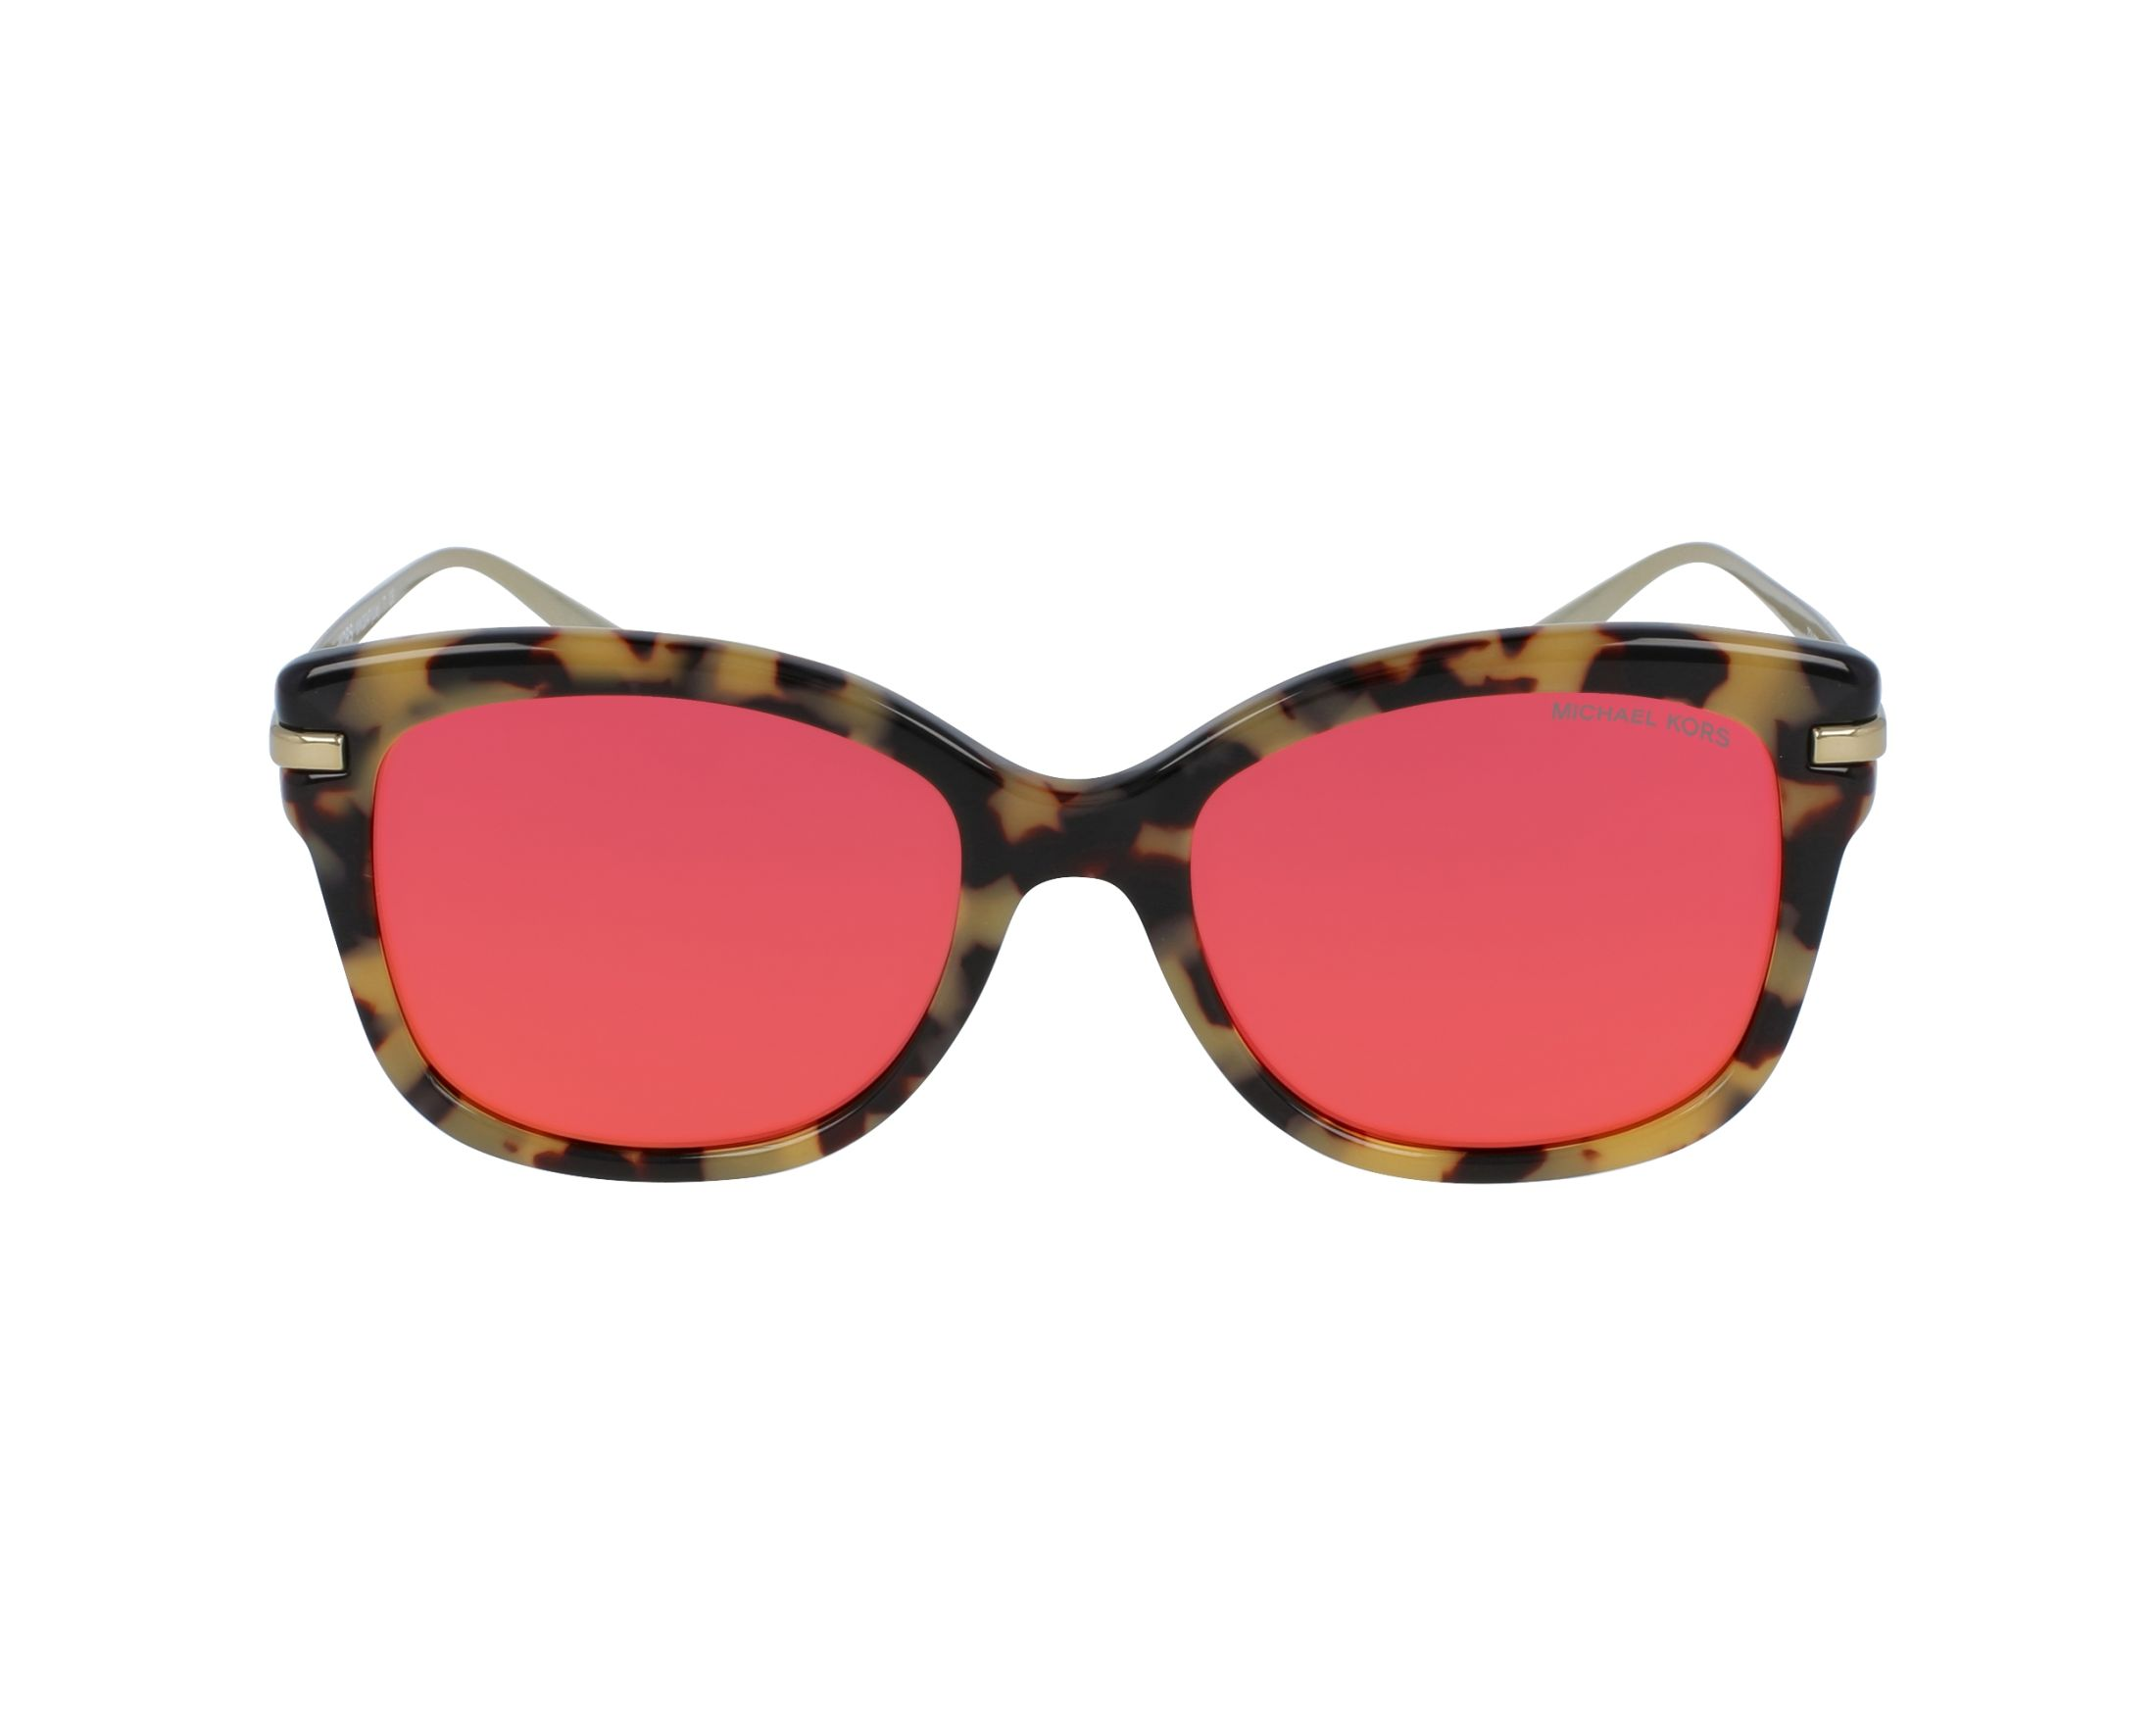 e70efe52d2 Sunglasses Michael Kors MK-2047 32446Q 53-18 Havana Gold profile view